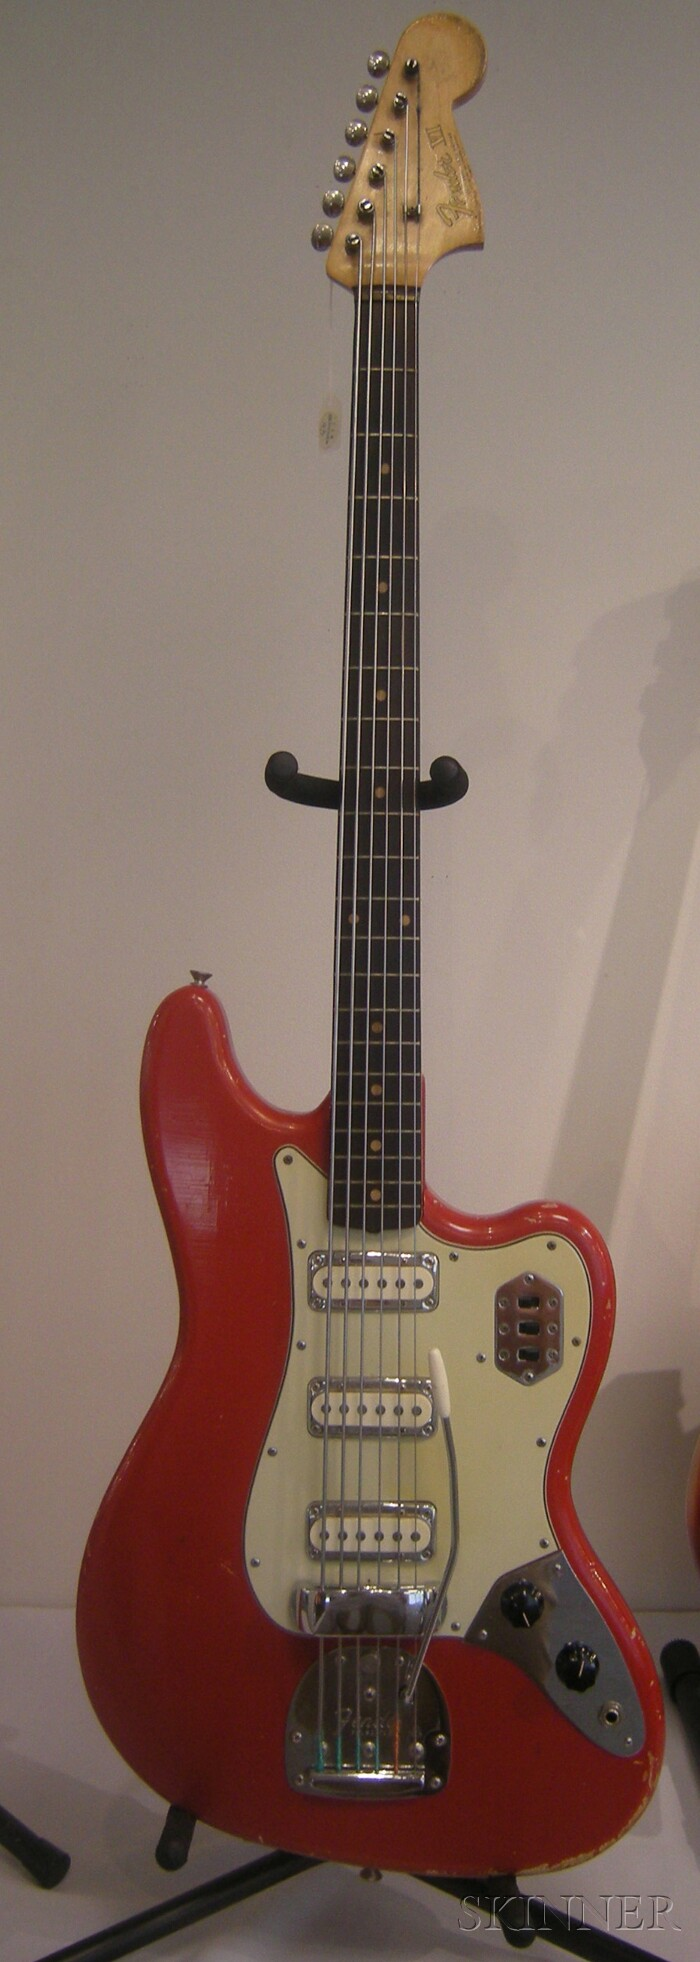 American Electric Guitar, Fender Musical Instruments, Santa Ana, 1966